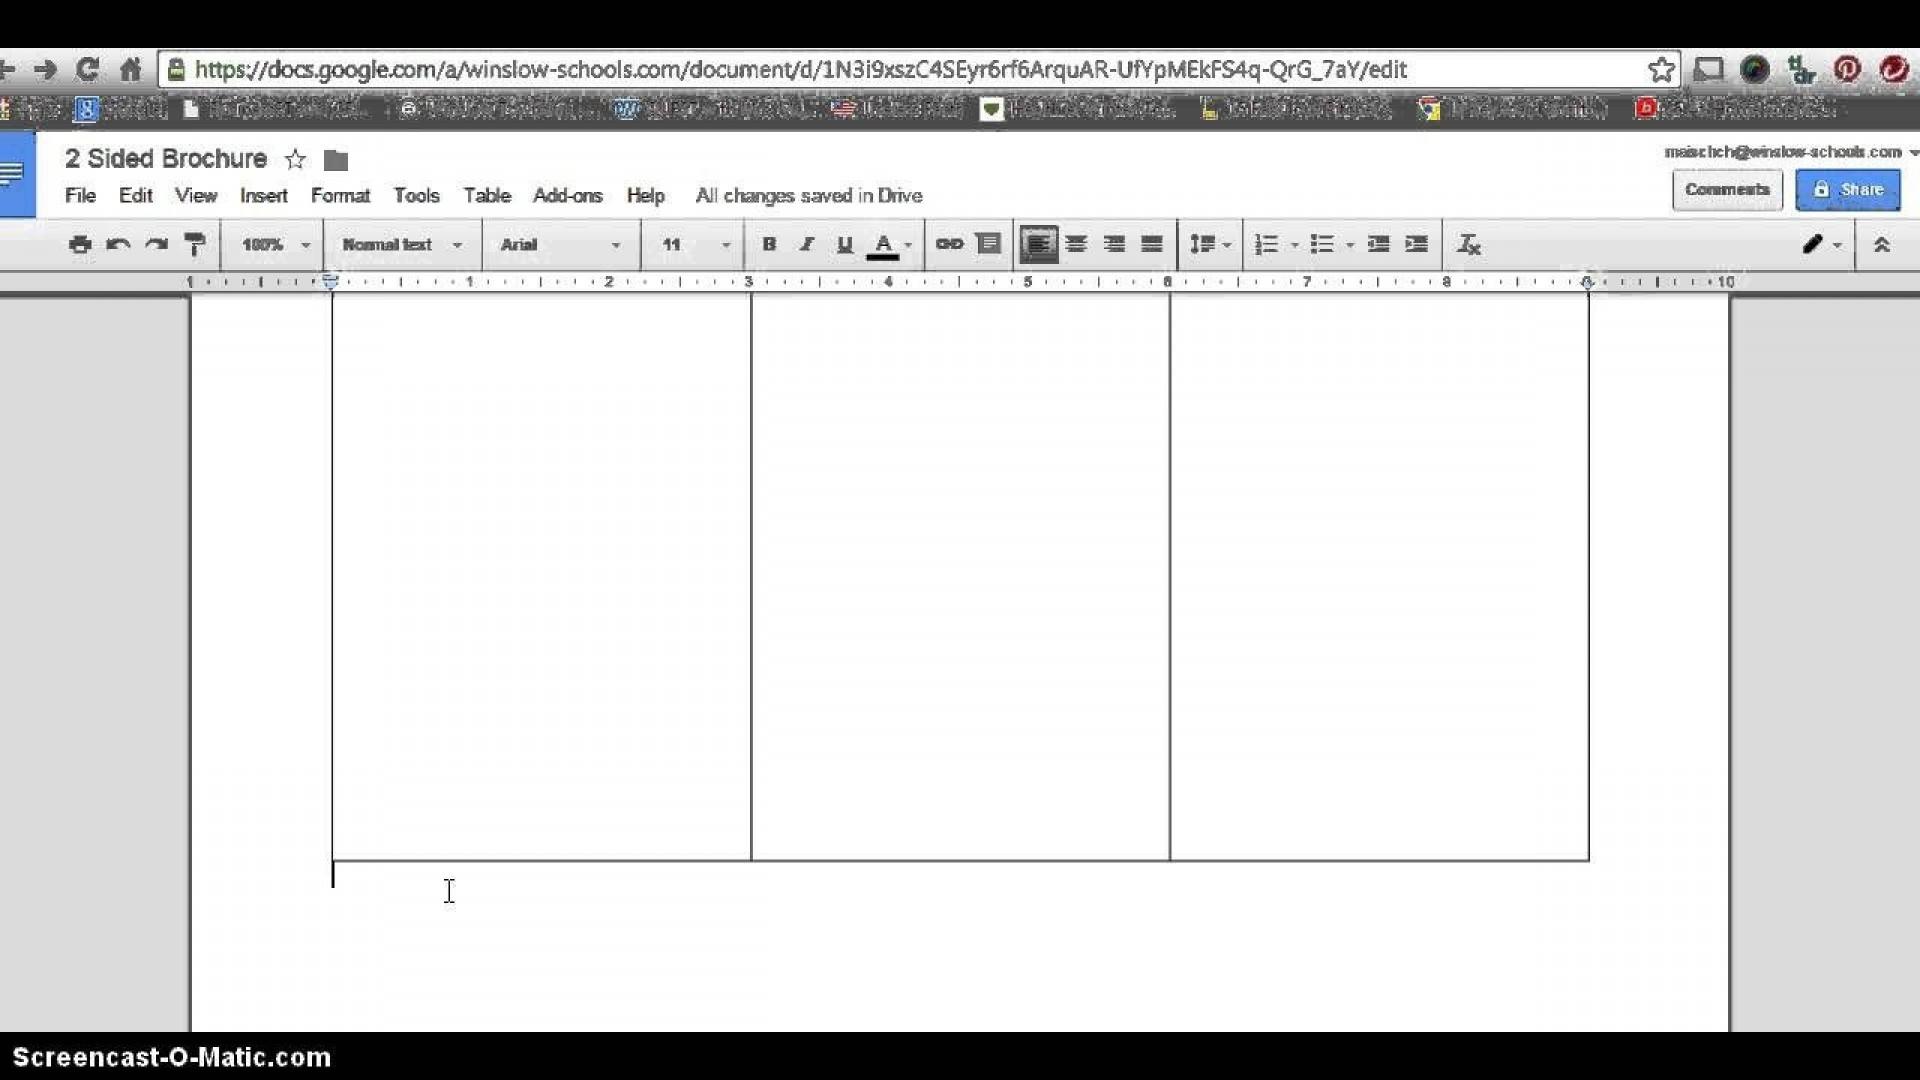 008 Stunning Brochure Template Google Doc High Resolution  Blank Tri Fold Slide1920